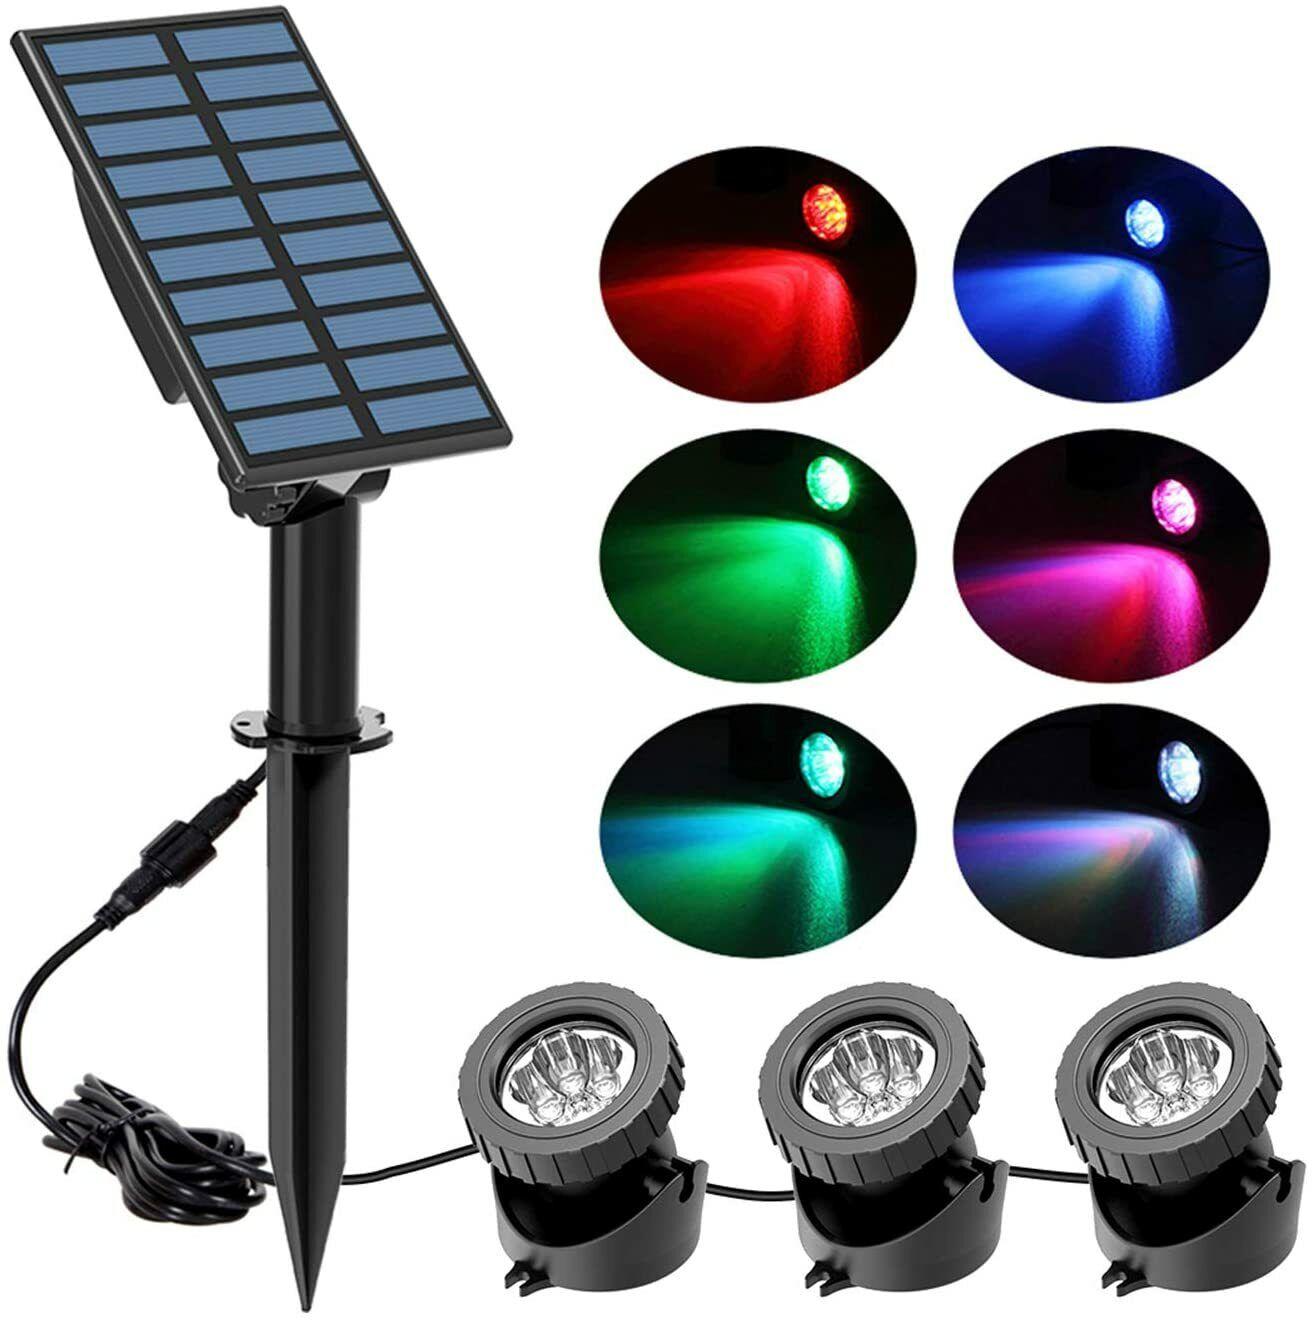 LED Solar Light RGB Changing Submersible Lamp Underwater Garden Pool Pond Lights